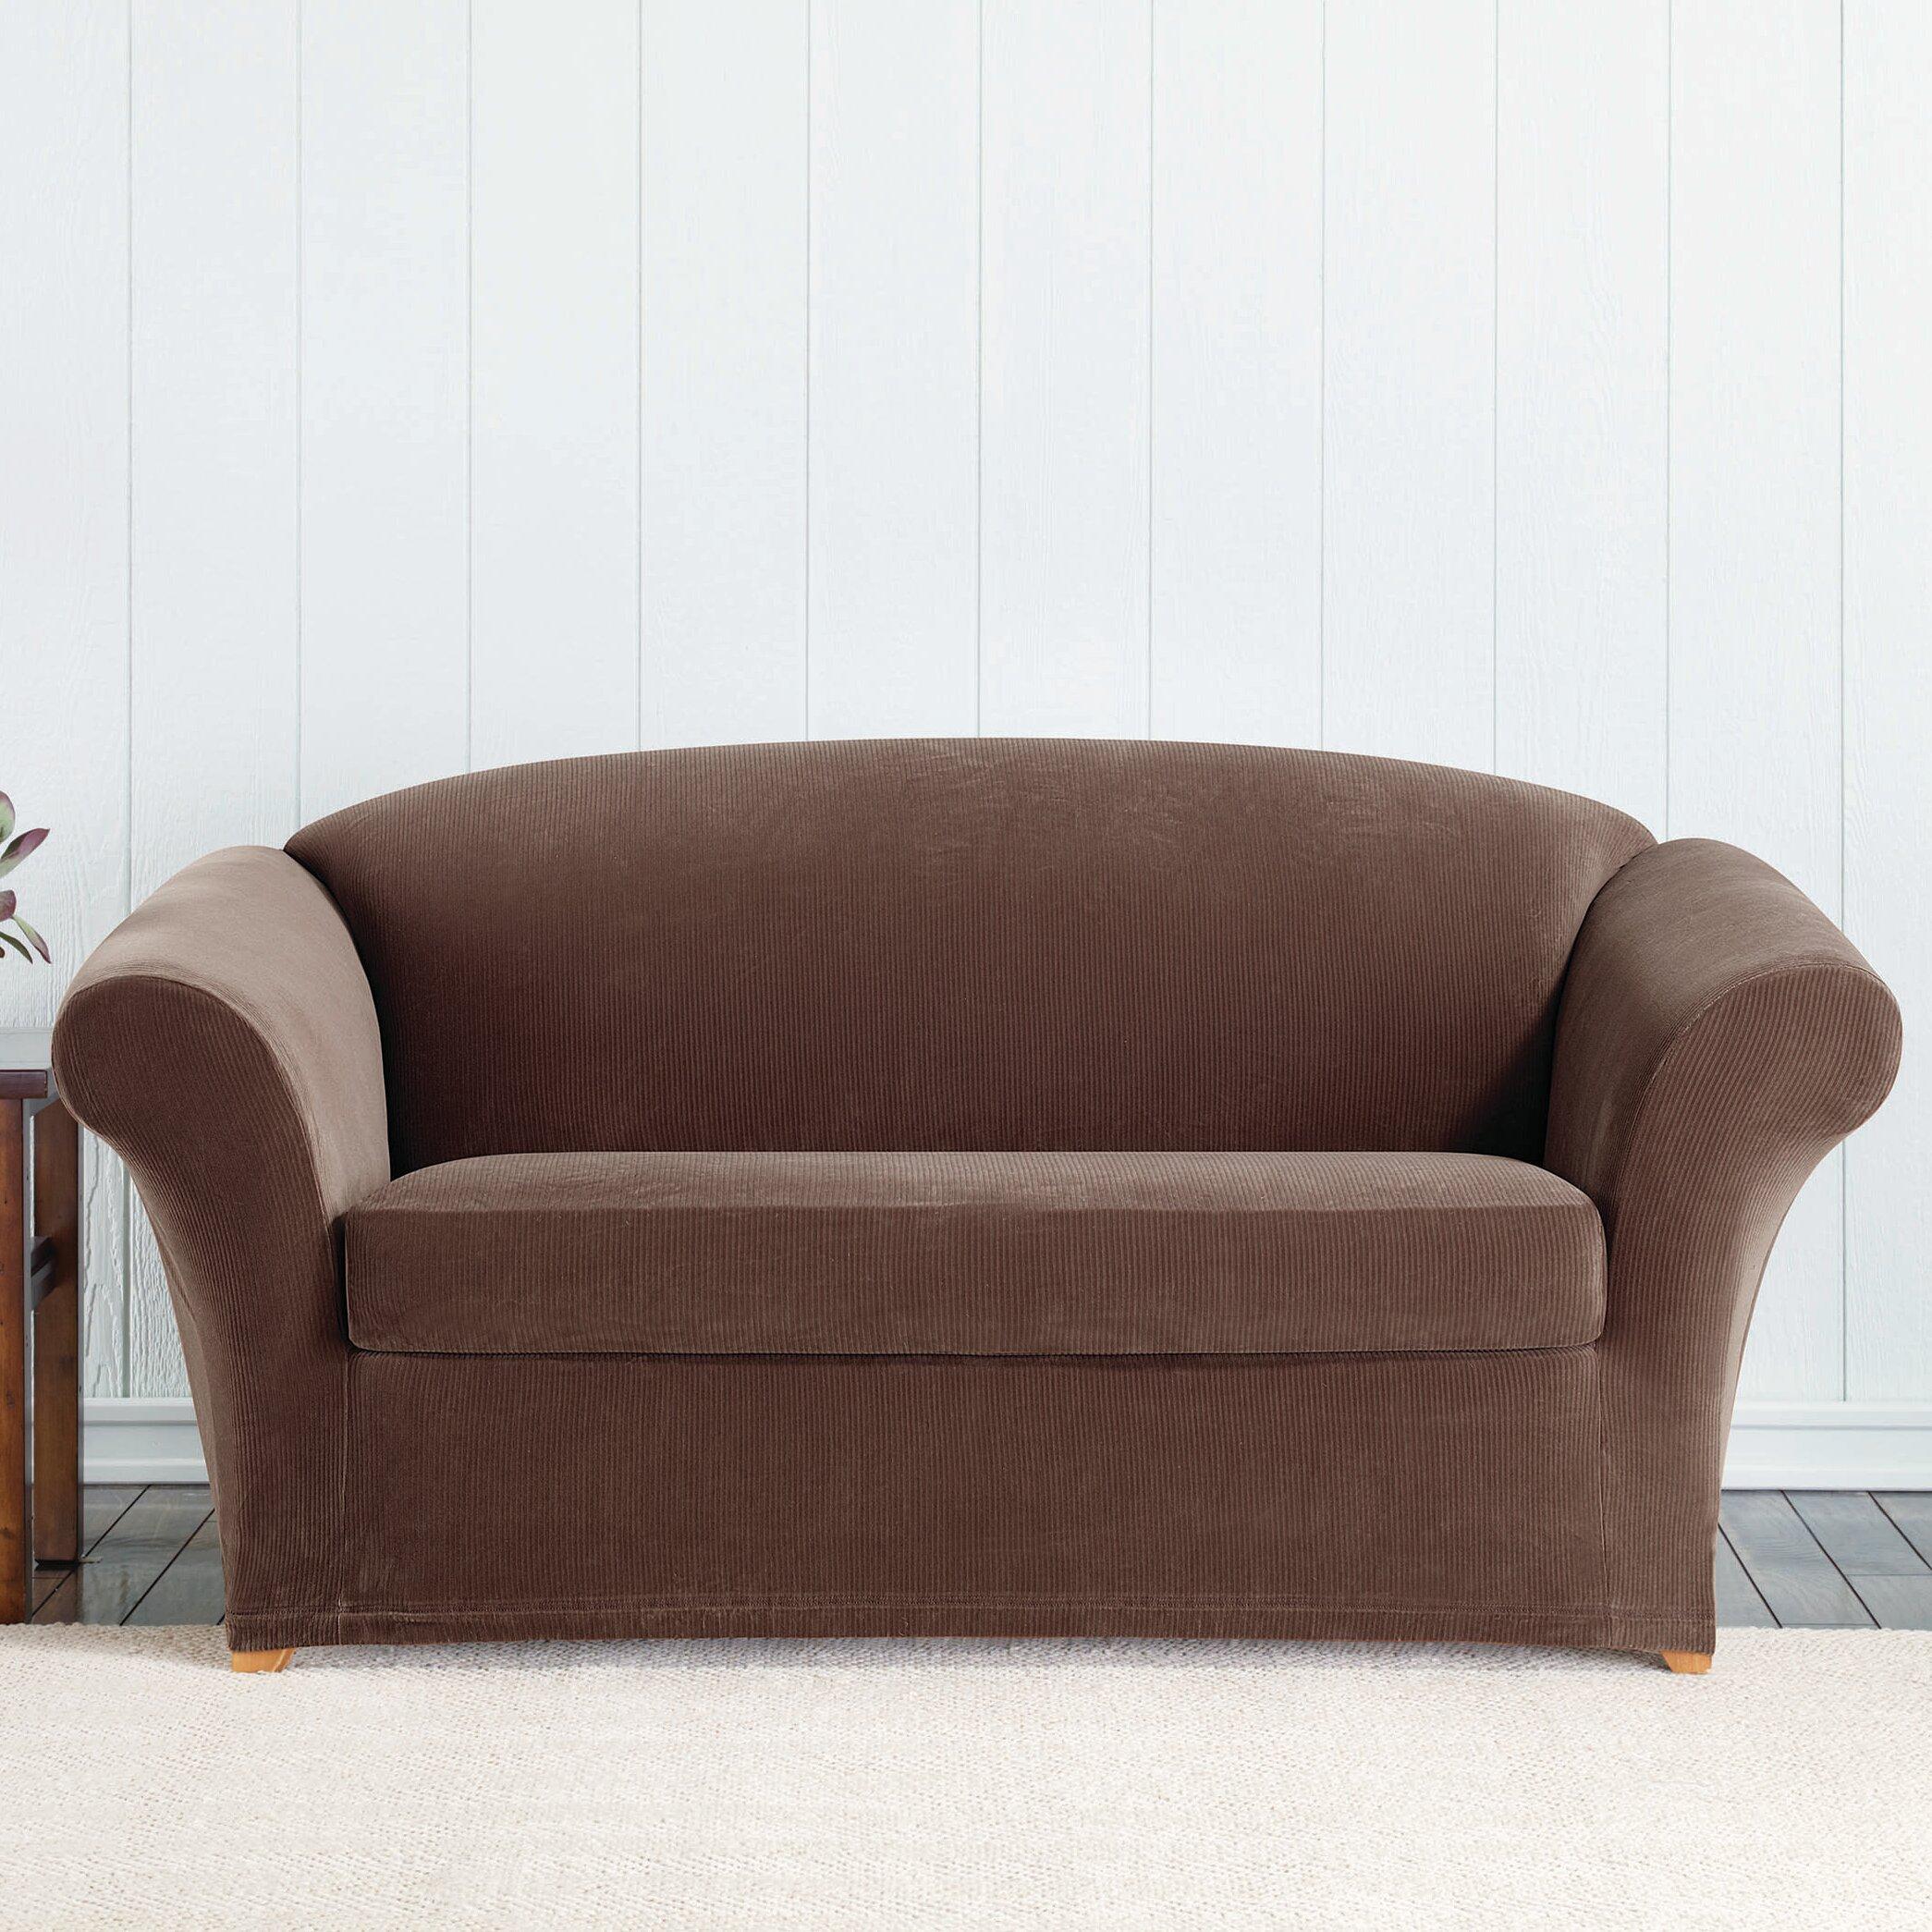 Strange Sure Fit Stretch Corduroy Box Cushion Loveseat Slipcover Creativecarmelina Interior Chair Design Creativecarmelinacom